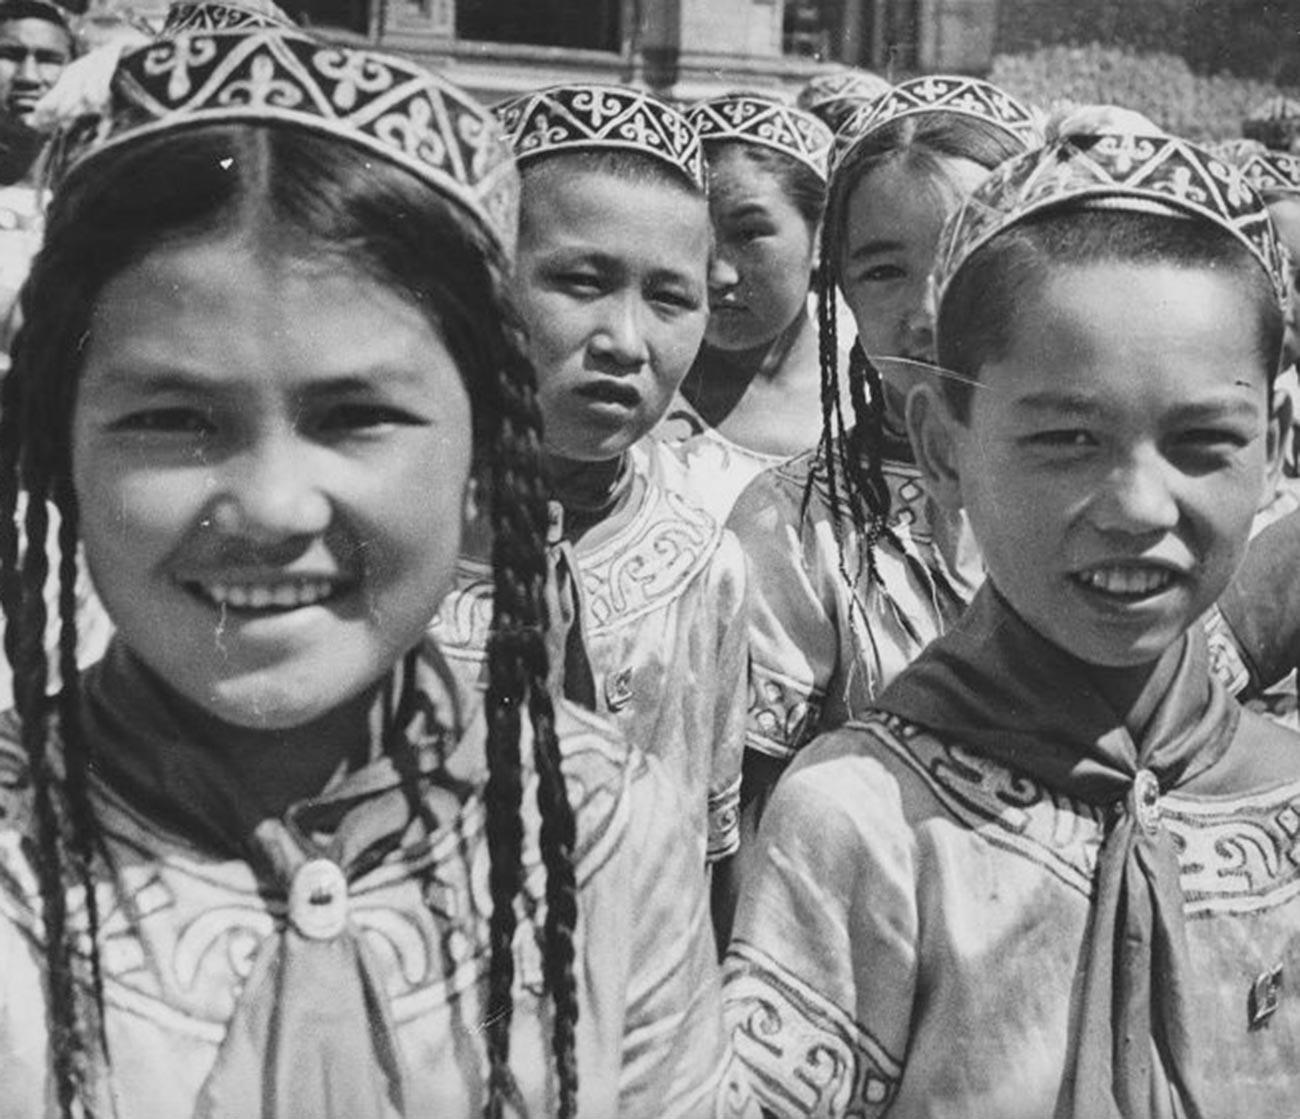 Pionniers kazakhs à Moscou, 1935